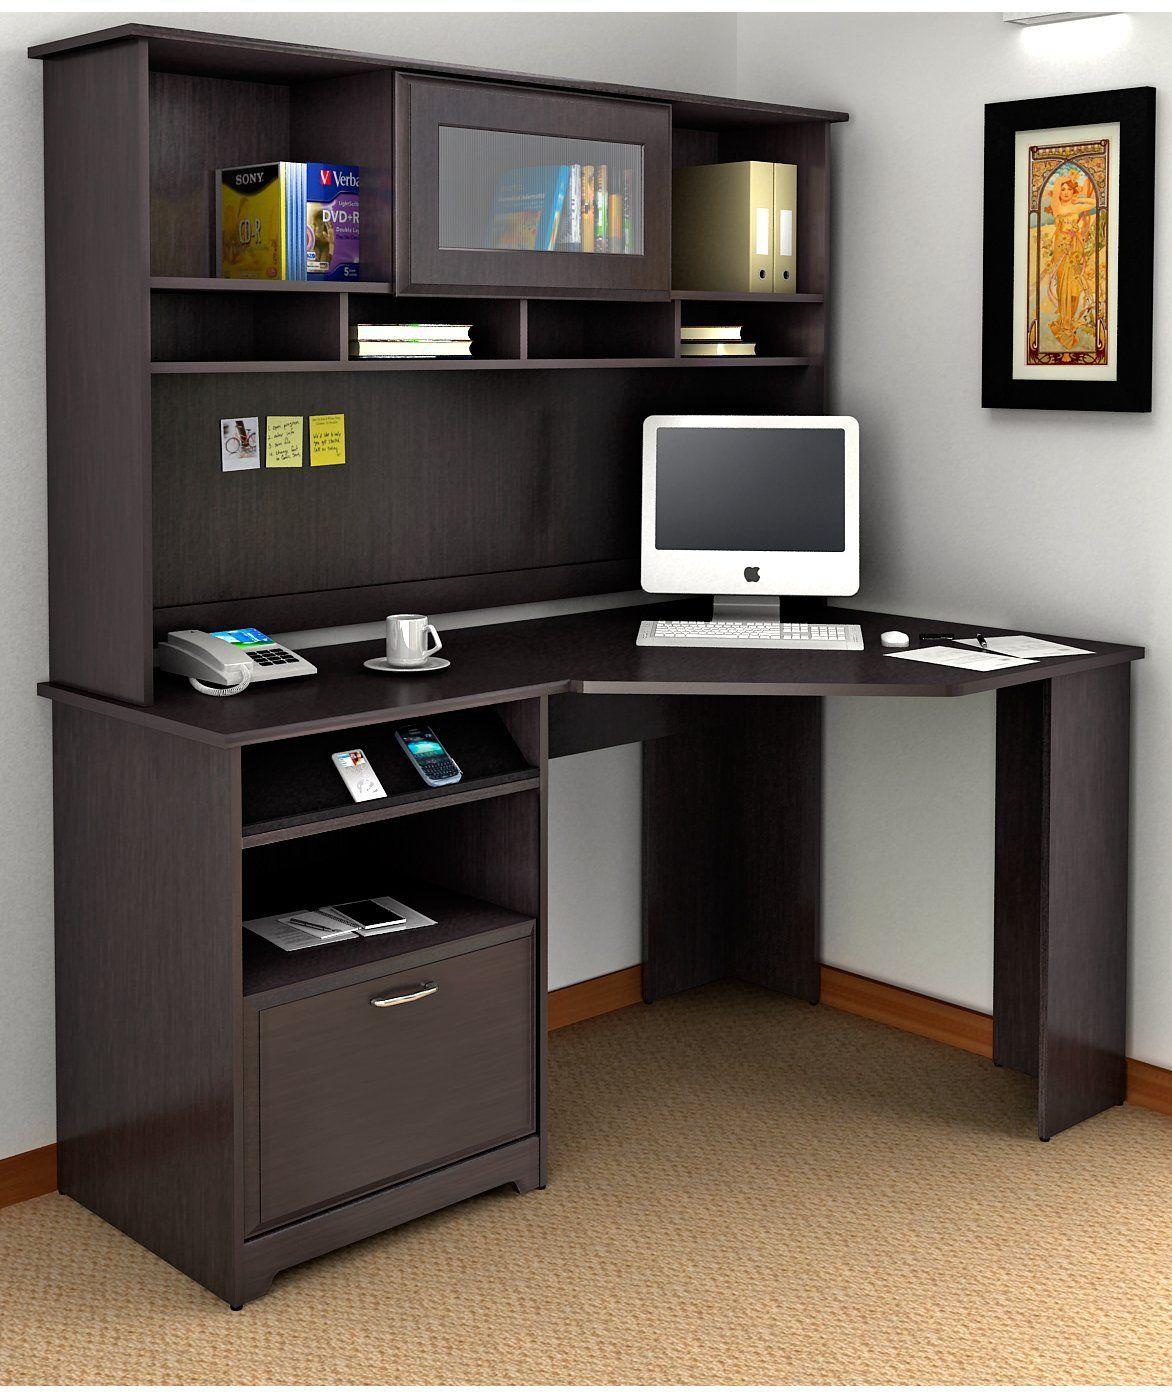 Corner Computer Desk With Bookshelves Furniture Sets For Living Room Check Muebles De Oficina En Casa Escritorios De Oficina En Casa Muebles Para Computadora